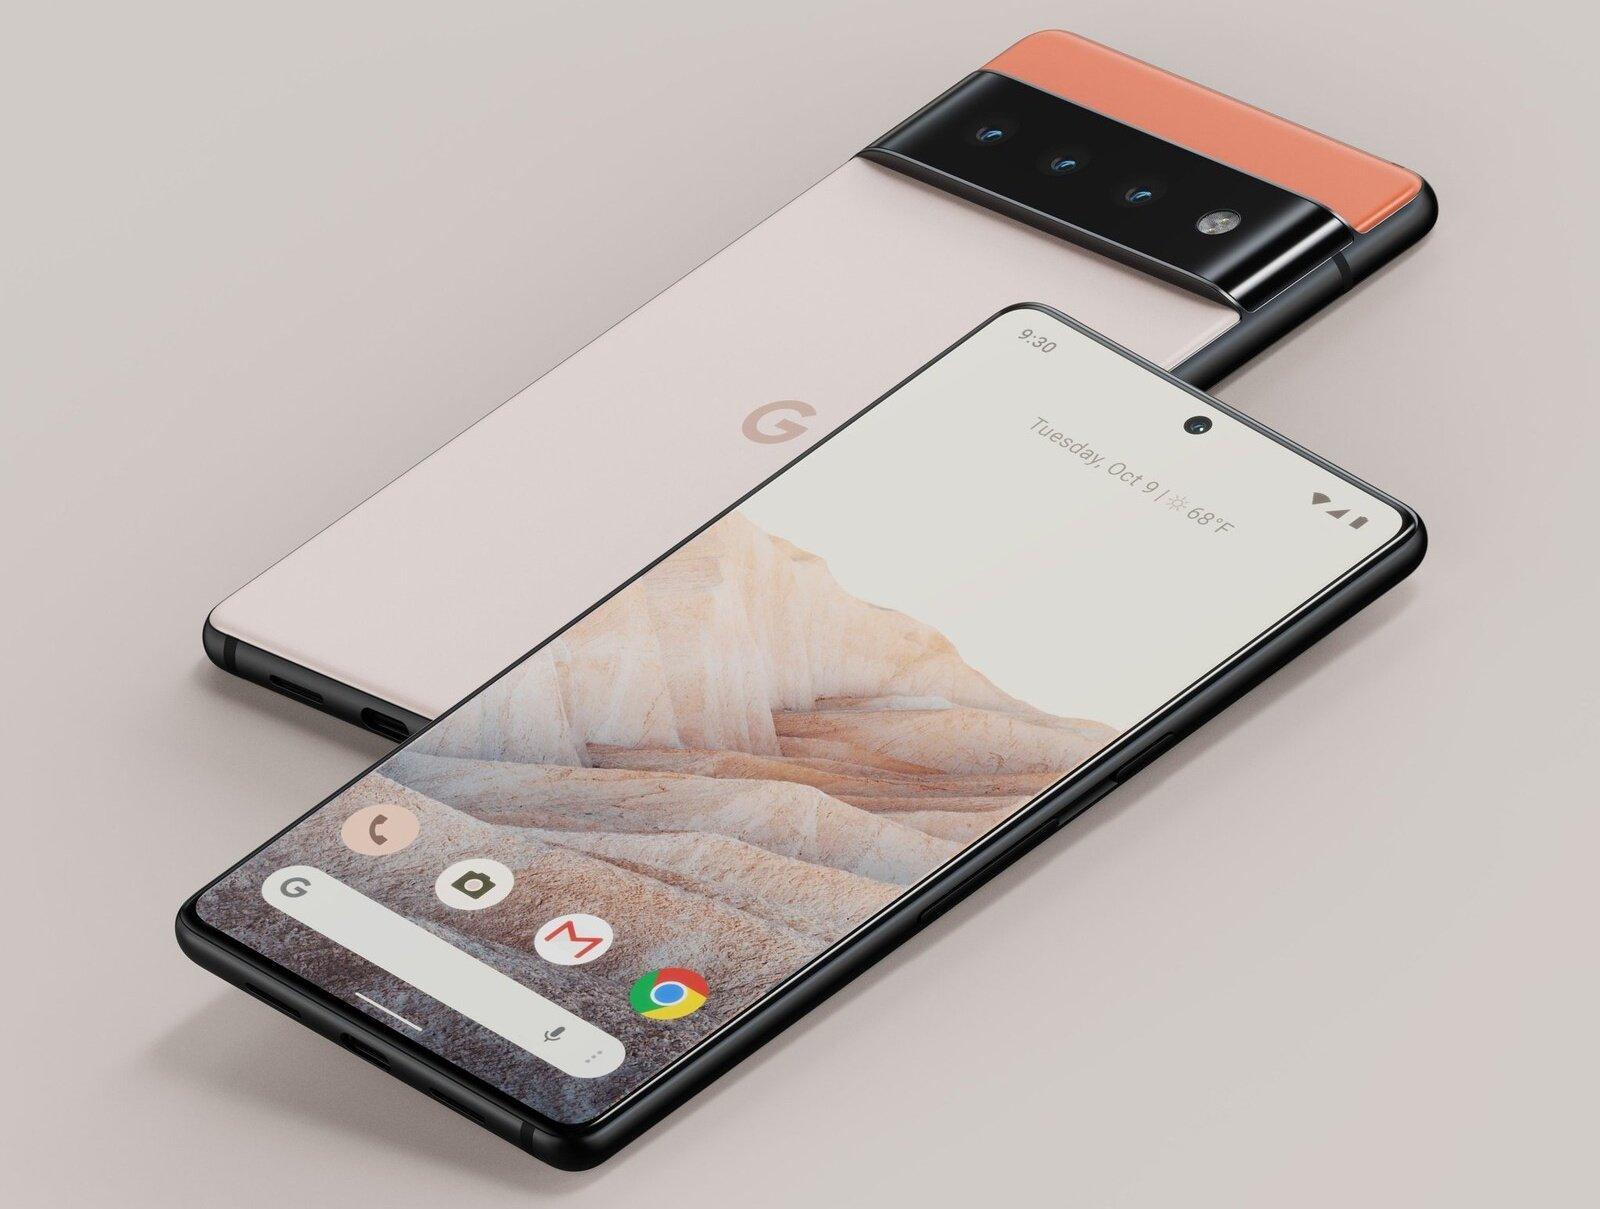 Cameras: iPhone 13 vs. Google Pixel 6